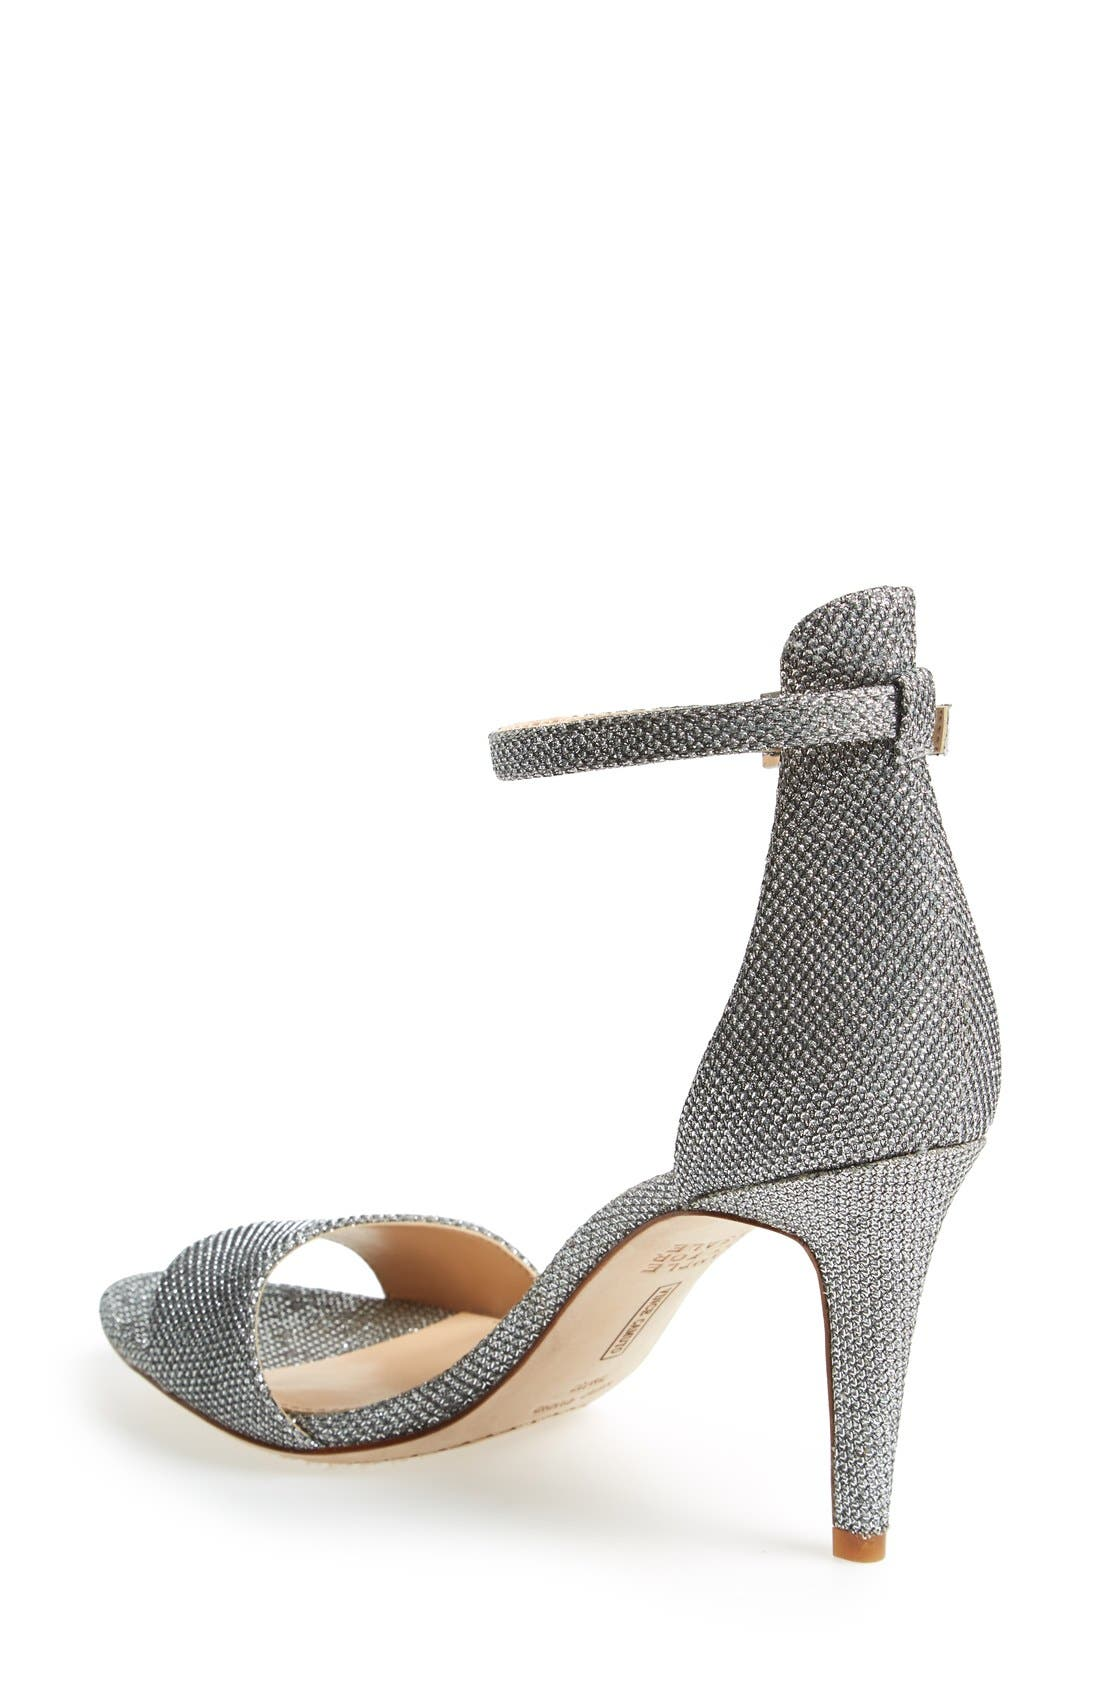 ,                             'Court' Ankle Strap Sandal,                             Alternate thumbnail 35, color,                             041